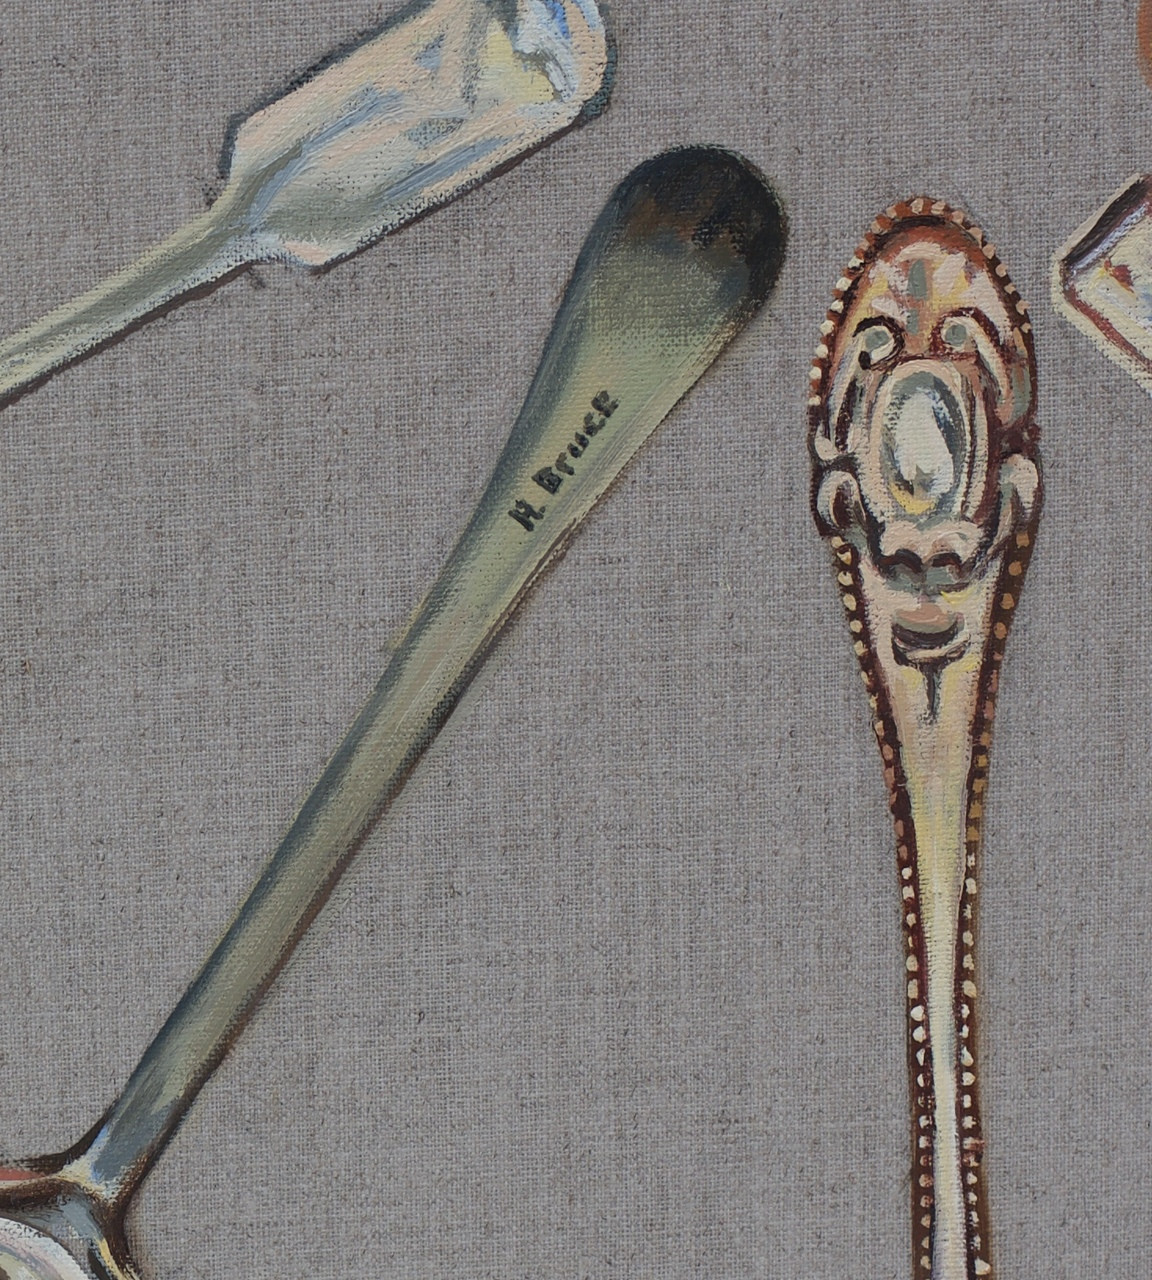 Spoons clock close up signature